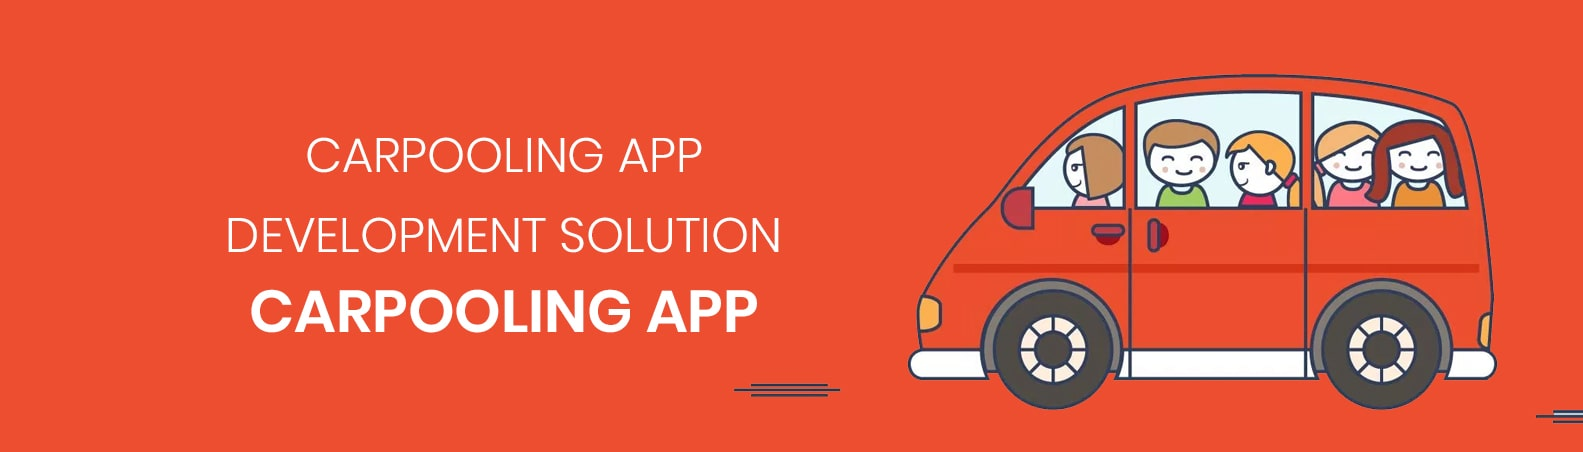 Carpooling App Development Solution Carpooling App 2base